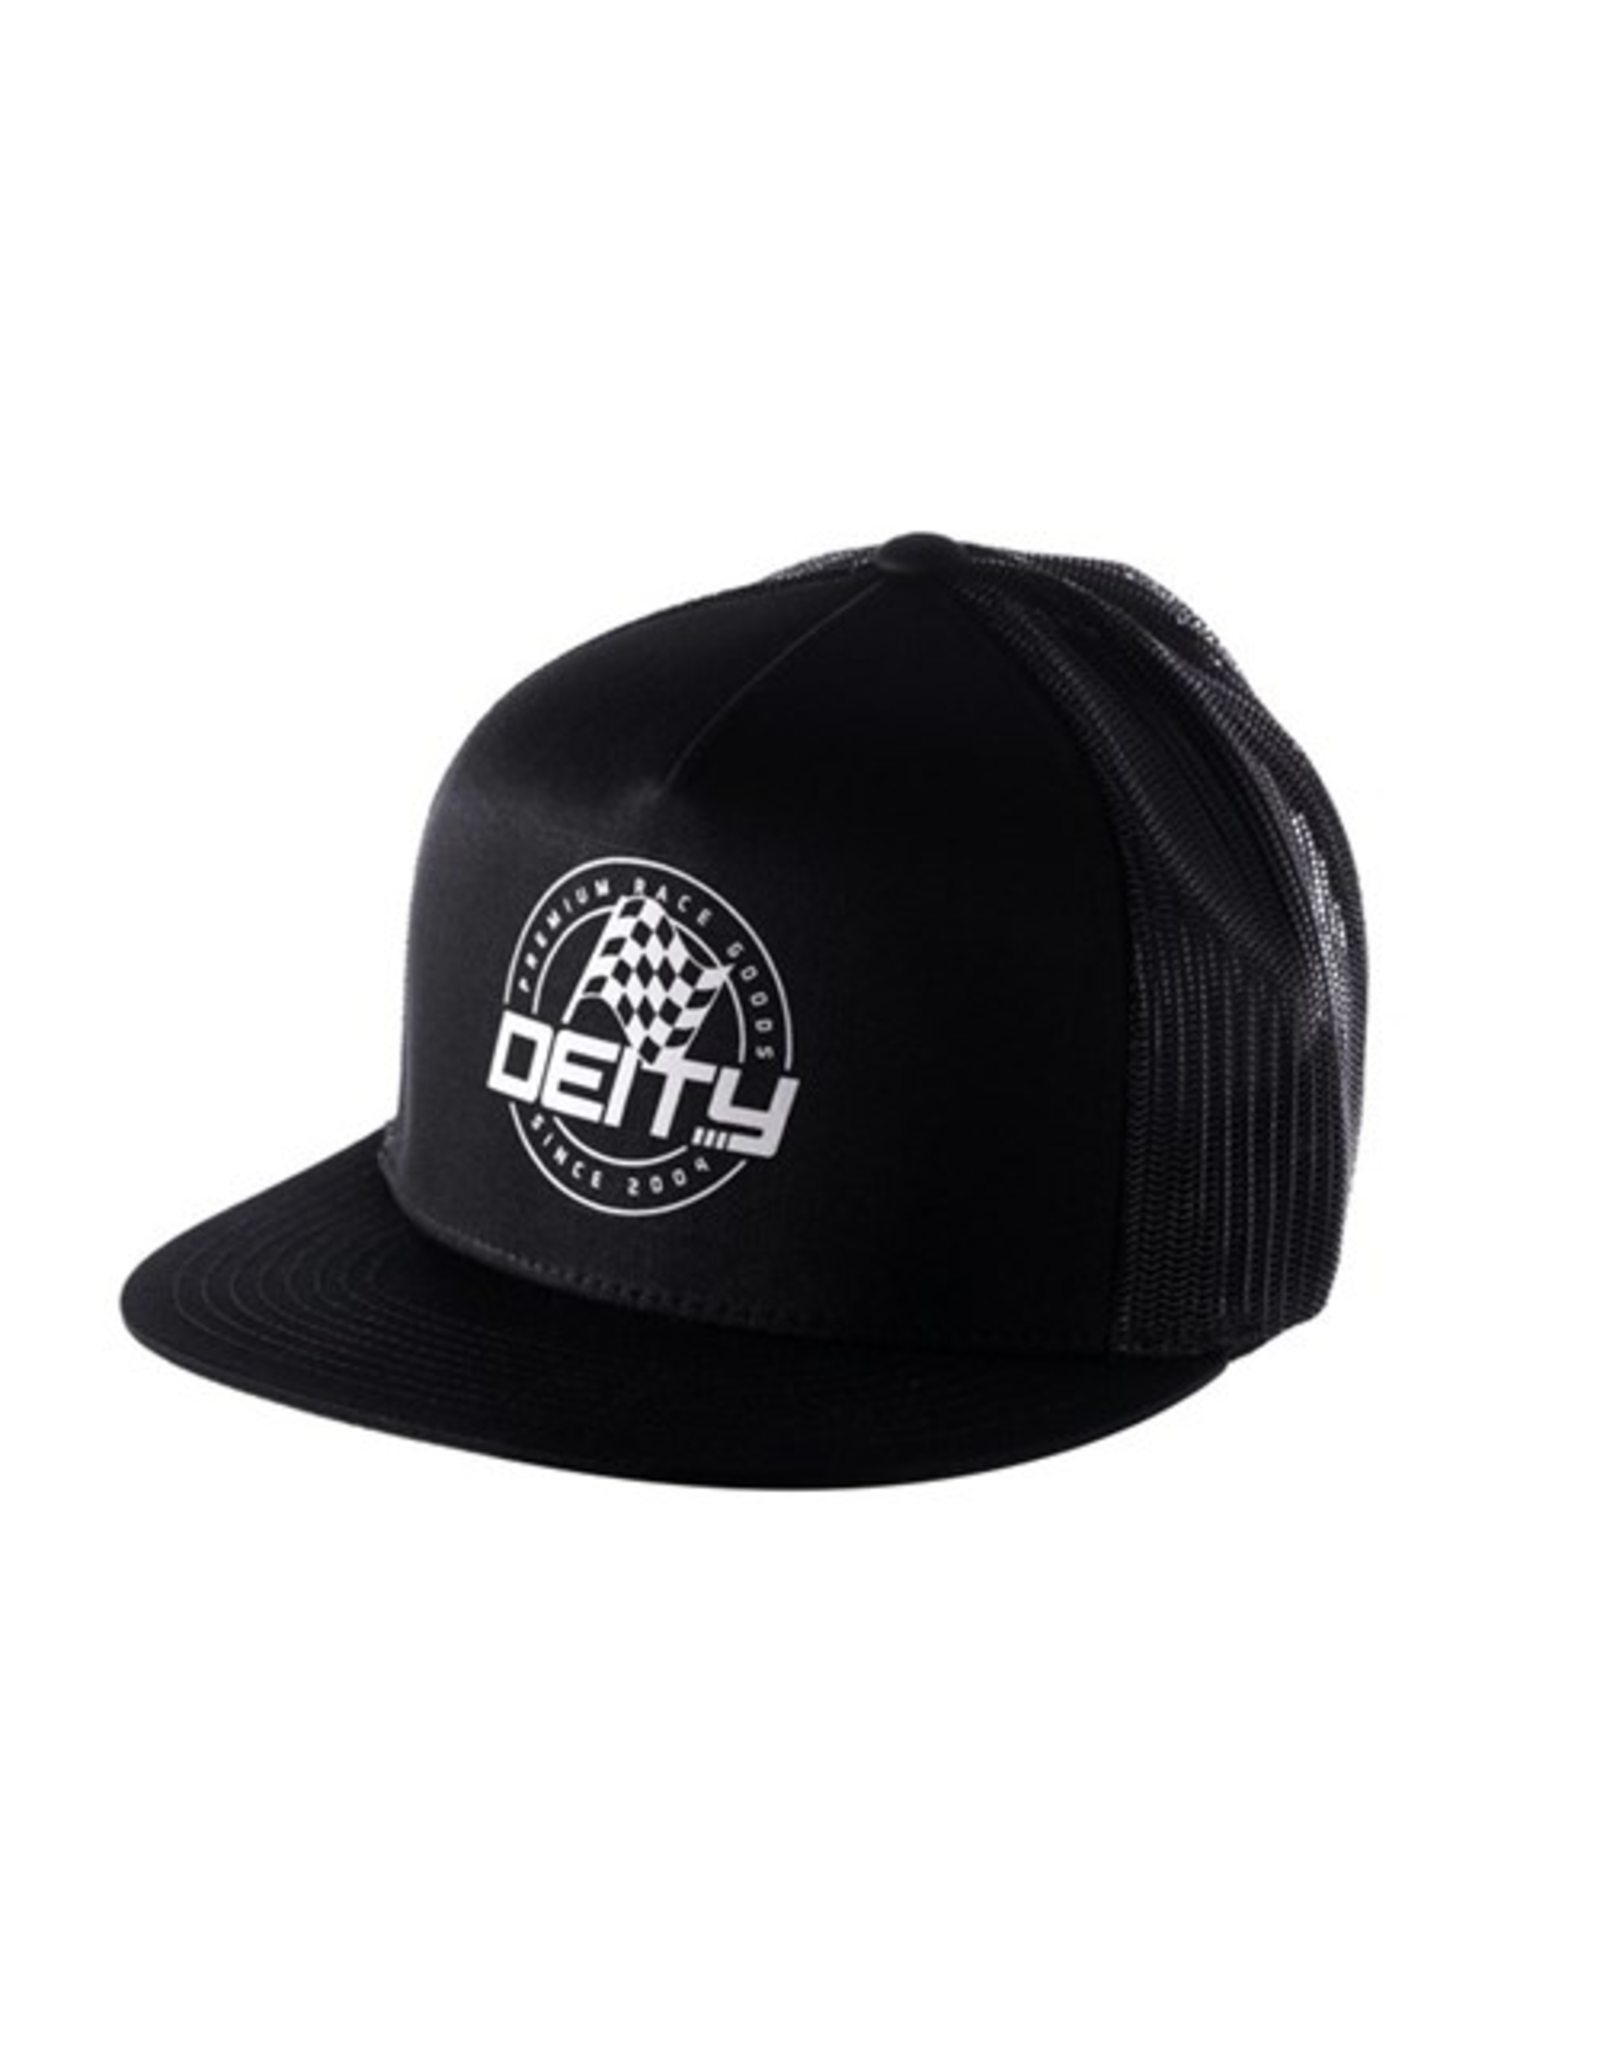 DEITY HAT DEITY PODIUM TRUCKER BLACK OSFA